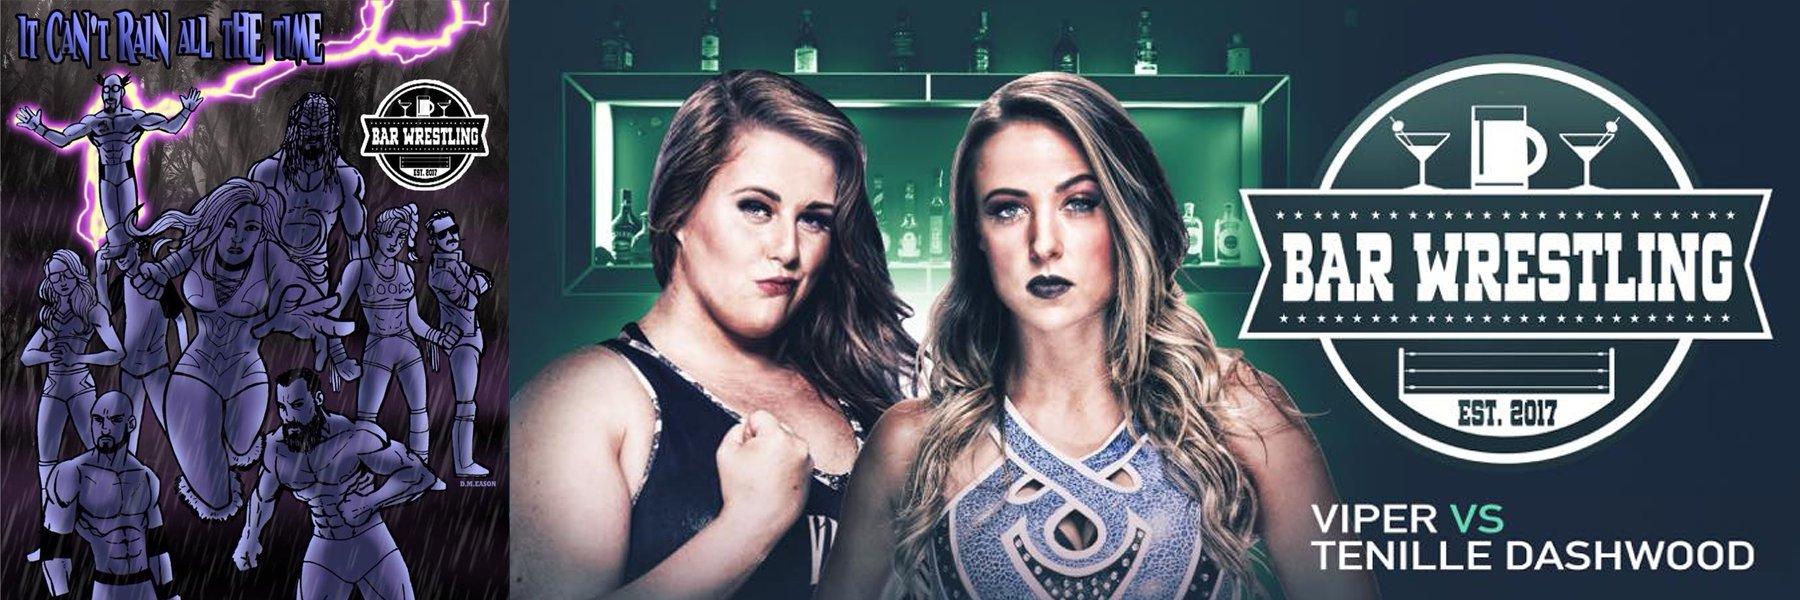 Bar Wrestling 19: Tenille Dashwood vs Viper, Joey Ryan vs Solo Darling